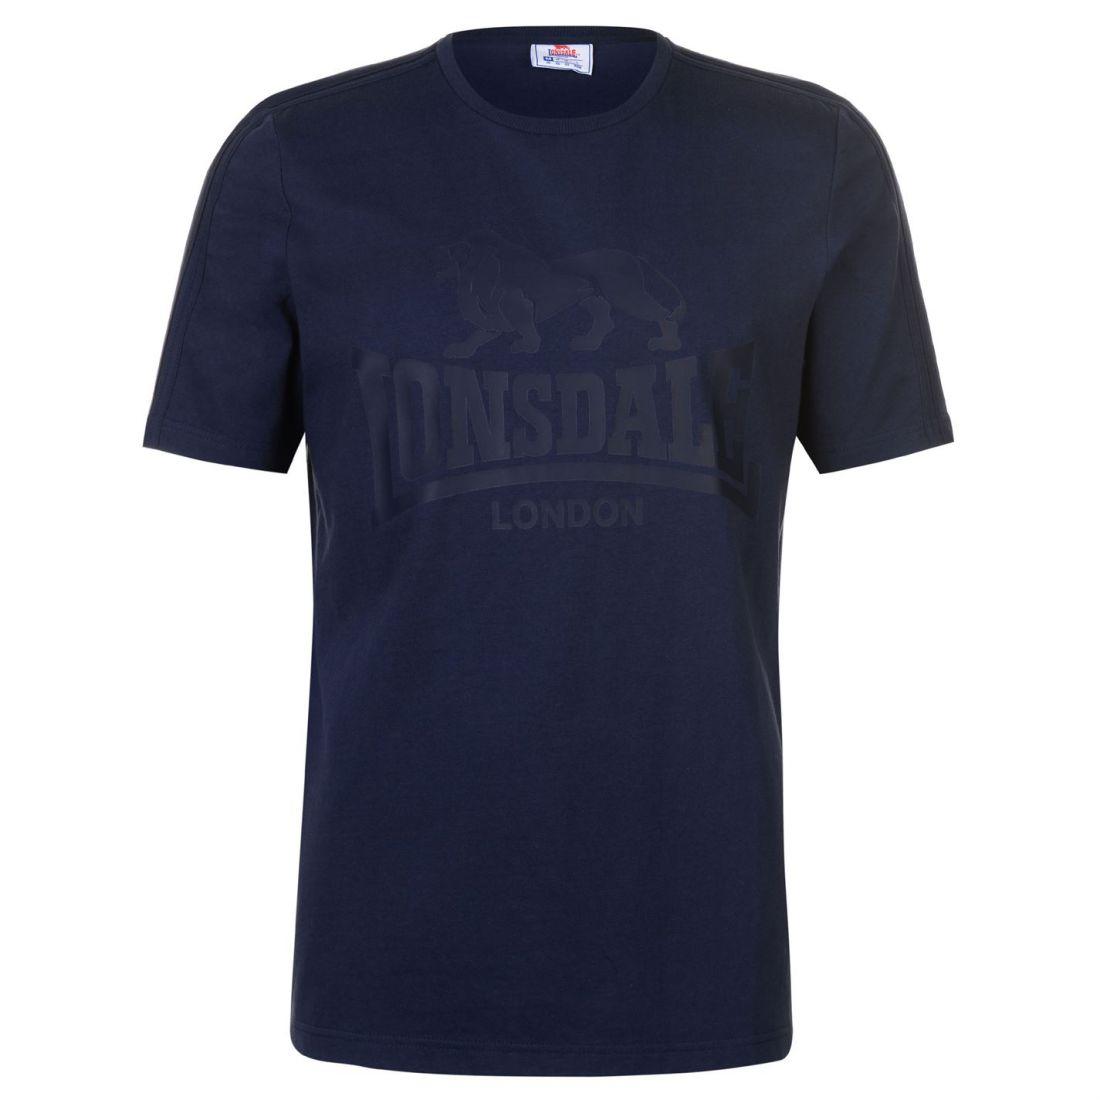 Lonsdale-Large-Logo-T-Shirt-Mens-Gents-Crew-Neck-Tee-Top-Short-Sleeve-Stripe